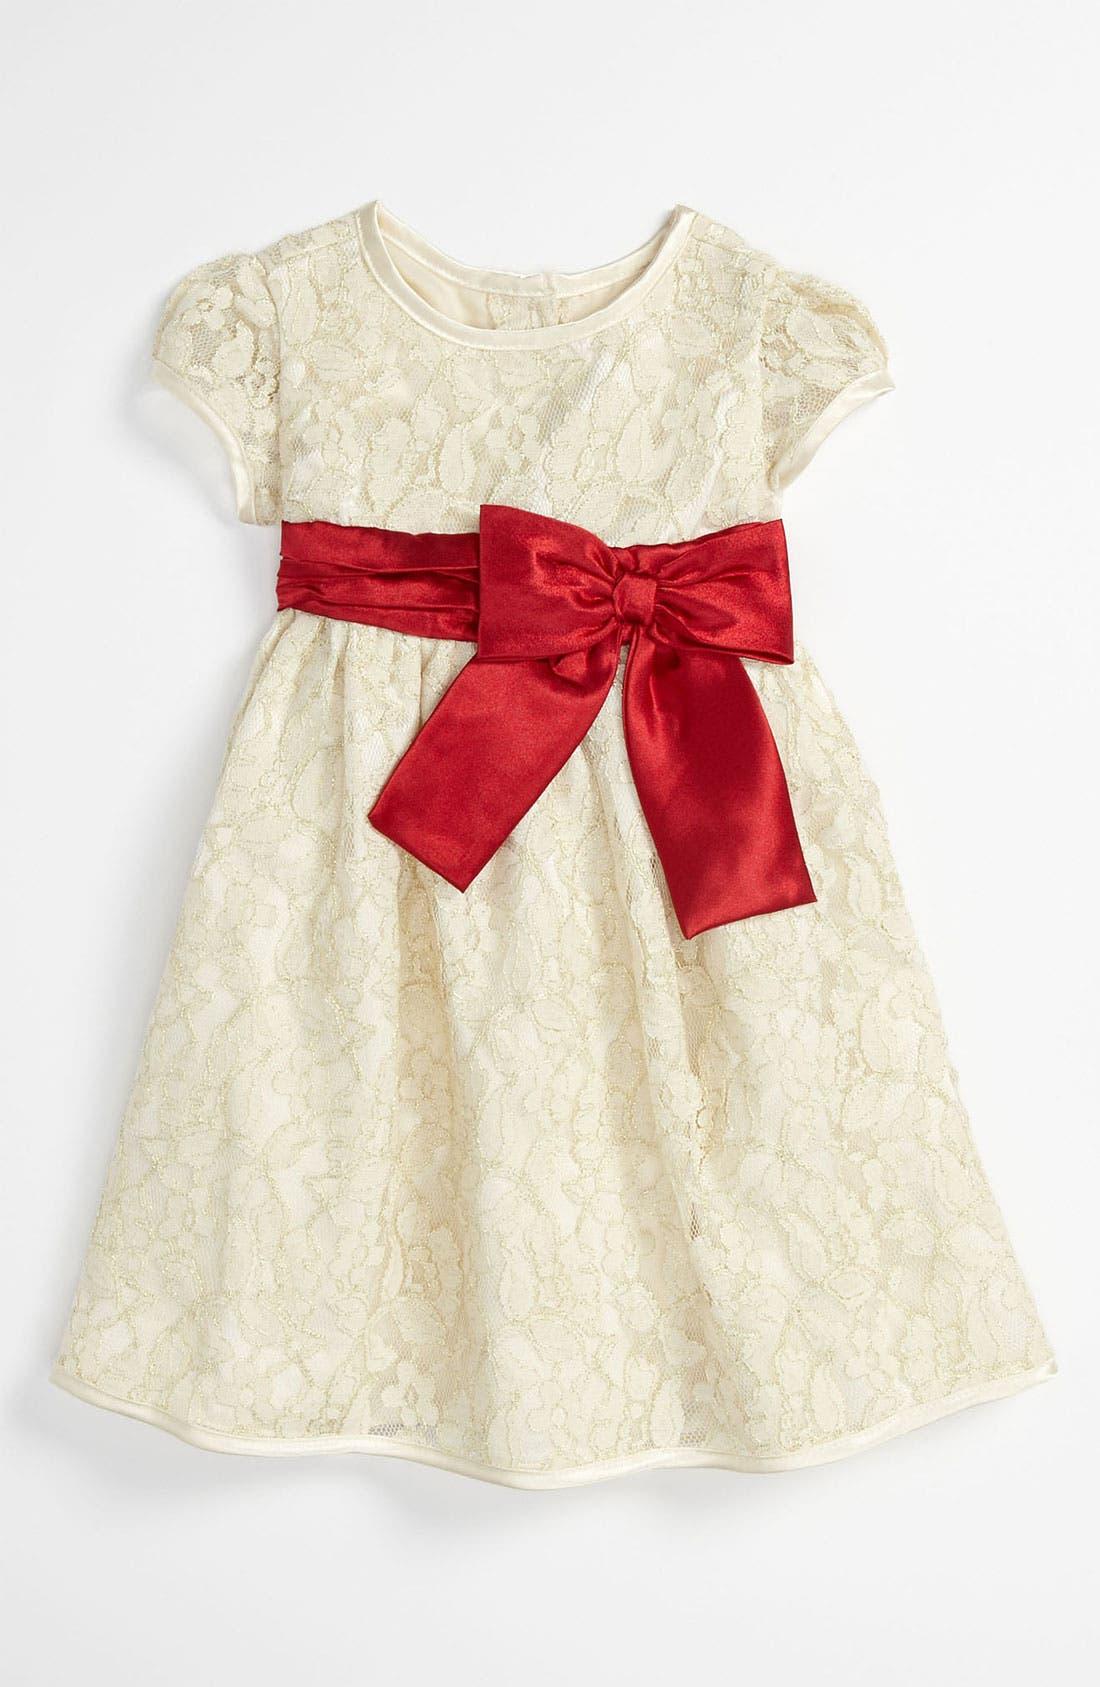 Main Image - Sweet Heart Rose Lace Dress (Toddler)